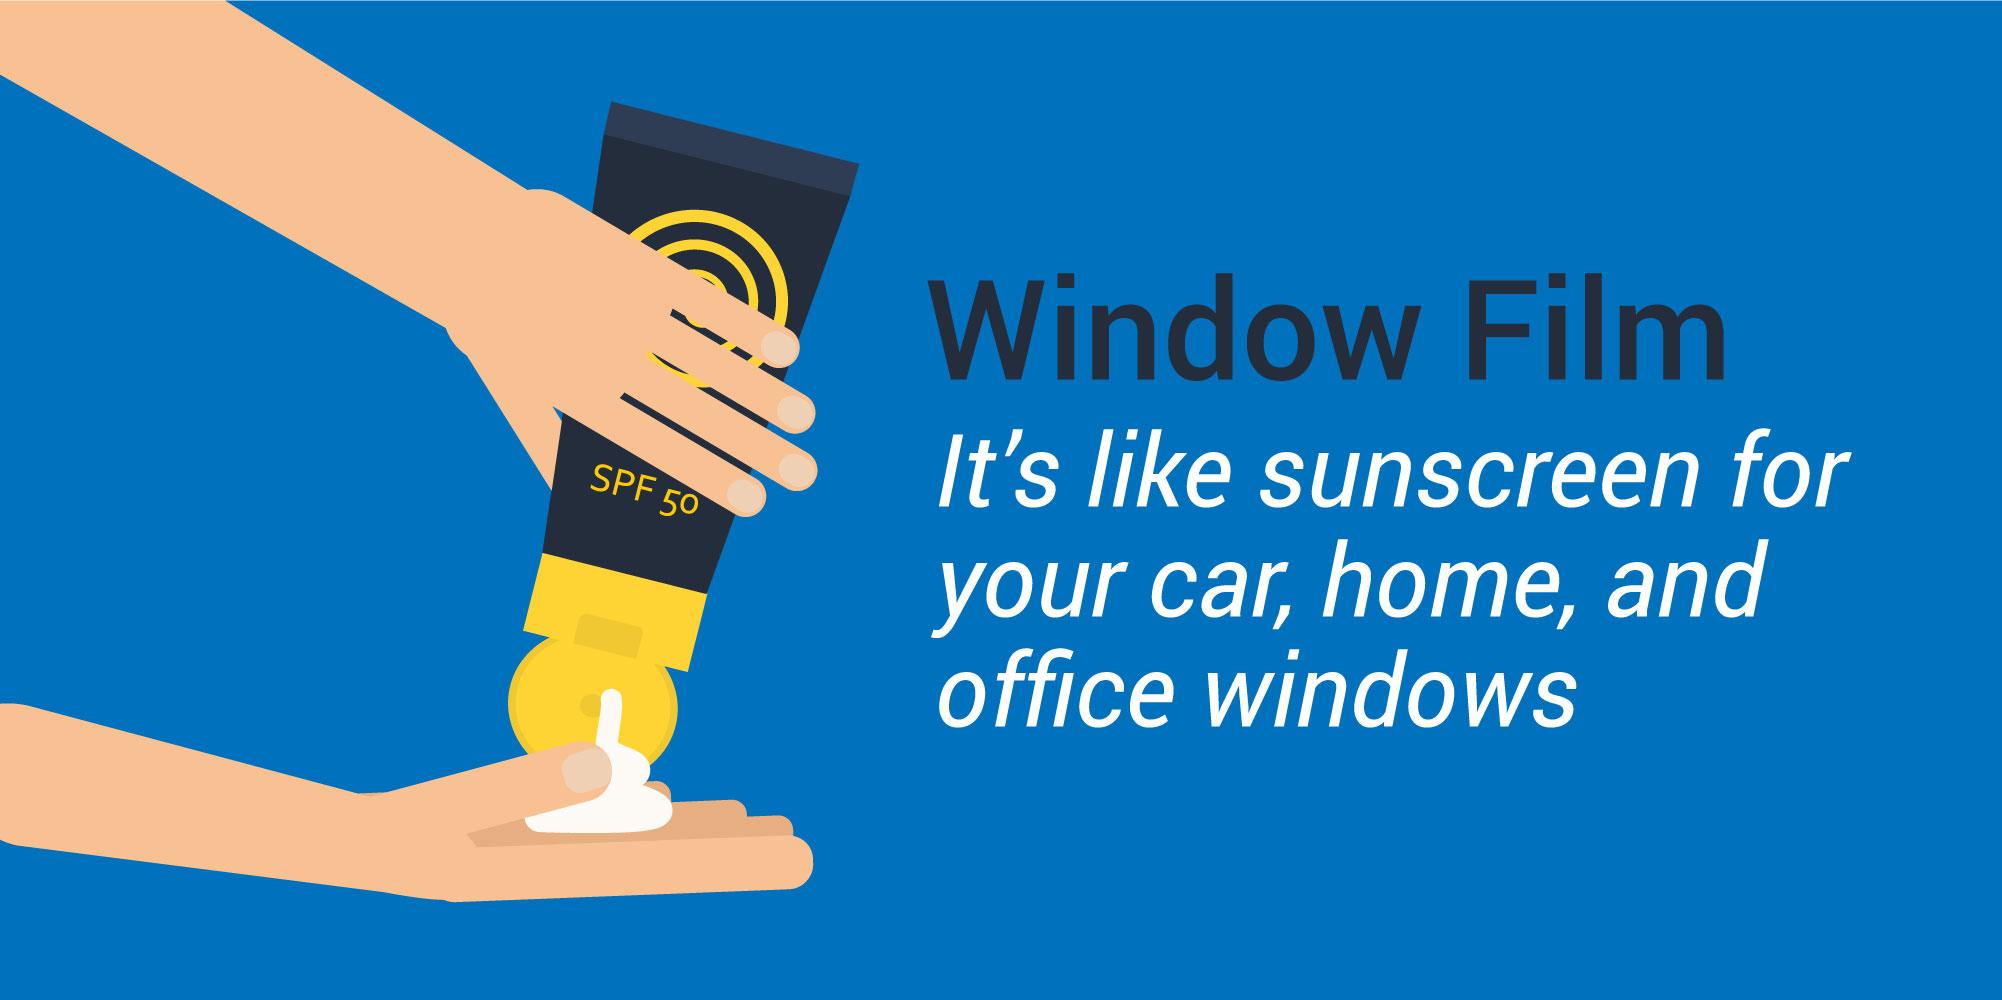 UV-Window-Film-for-Homes-Like-Sunscreen